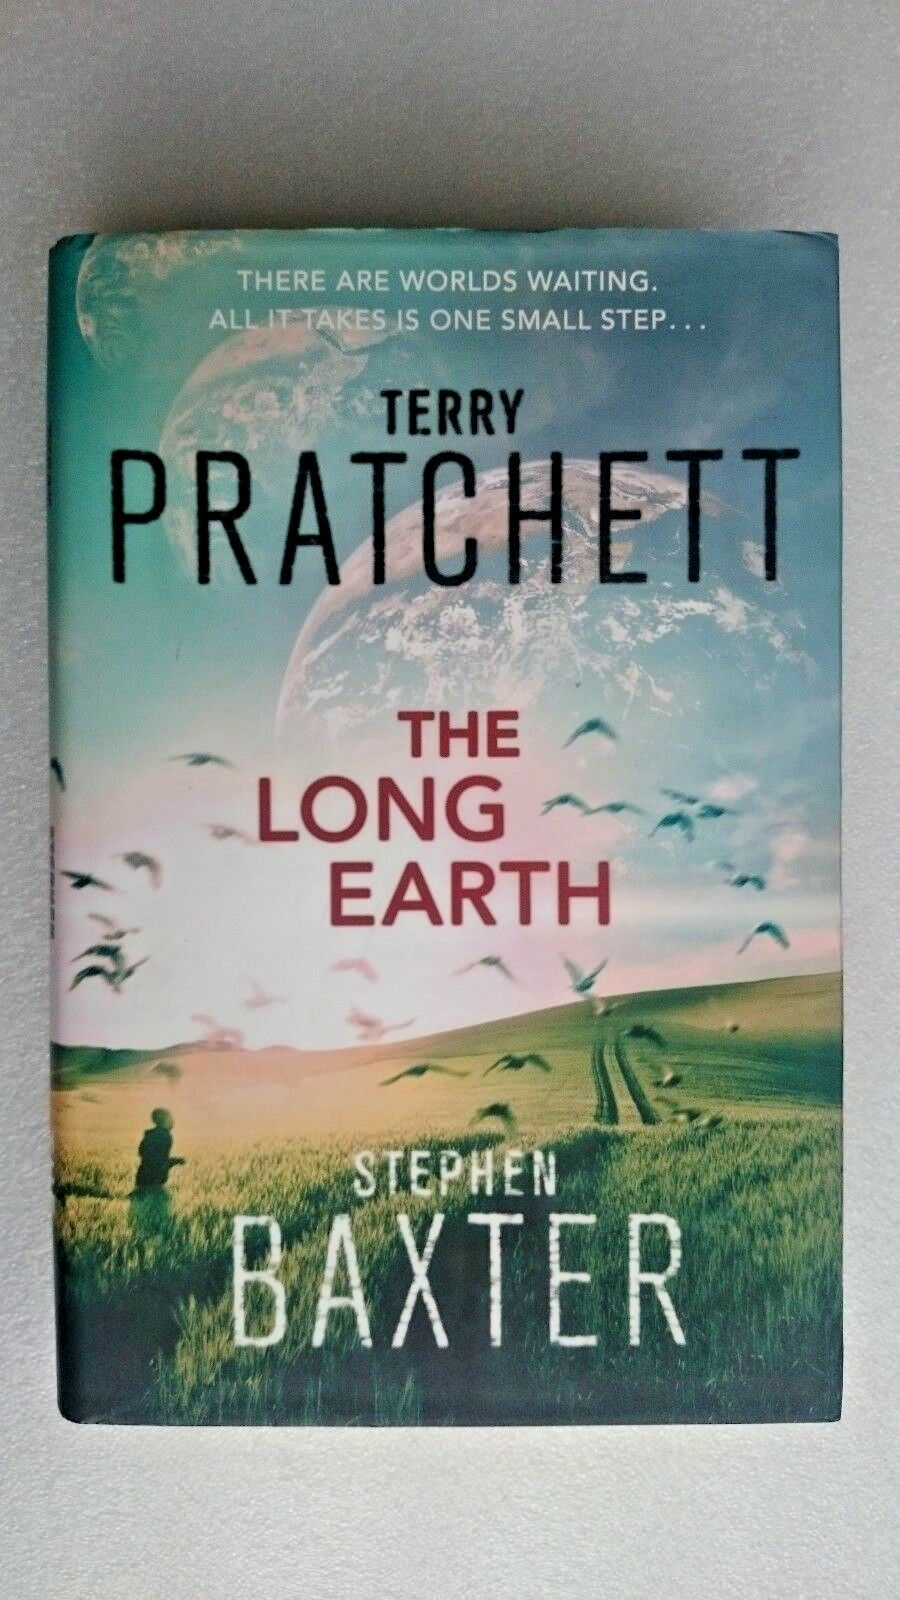 The Long Earth by Terry Pratchett, Stephen Baxter (Hardback, 2012)